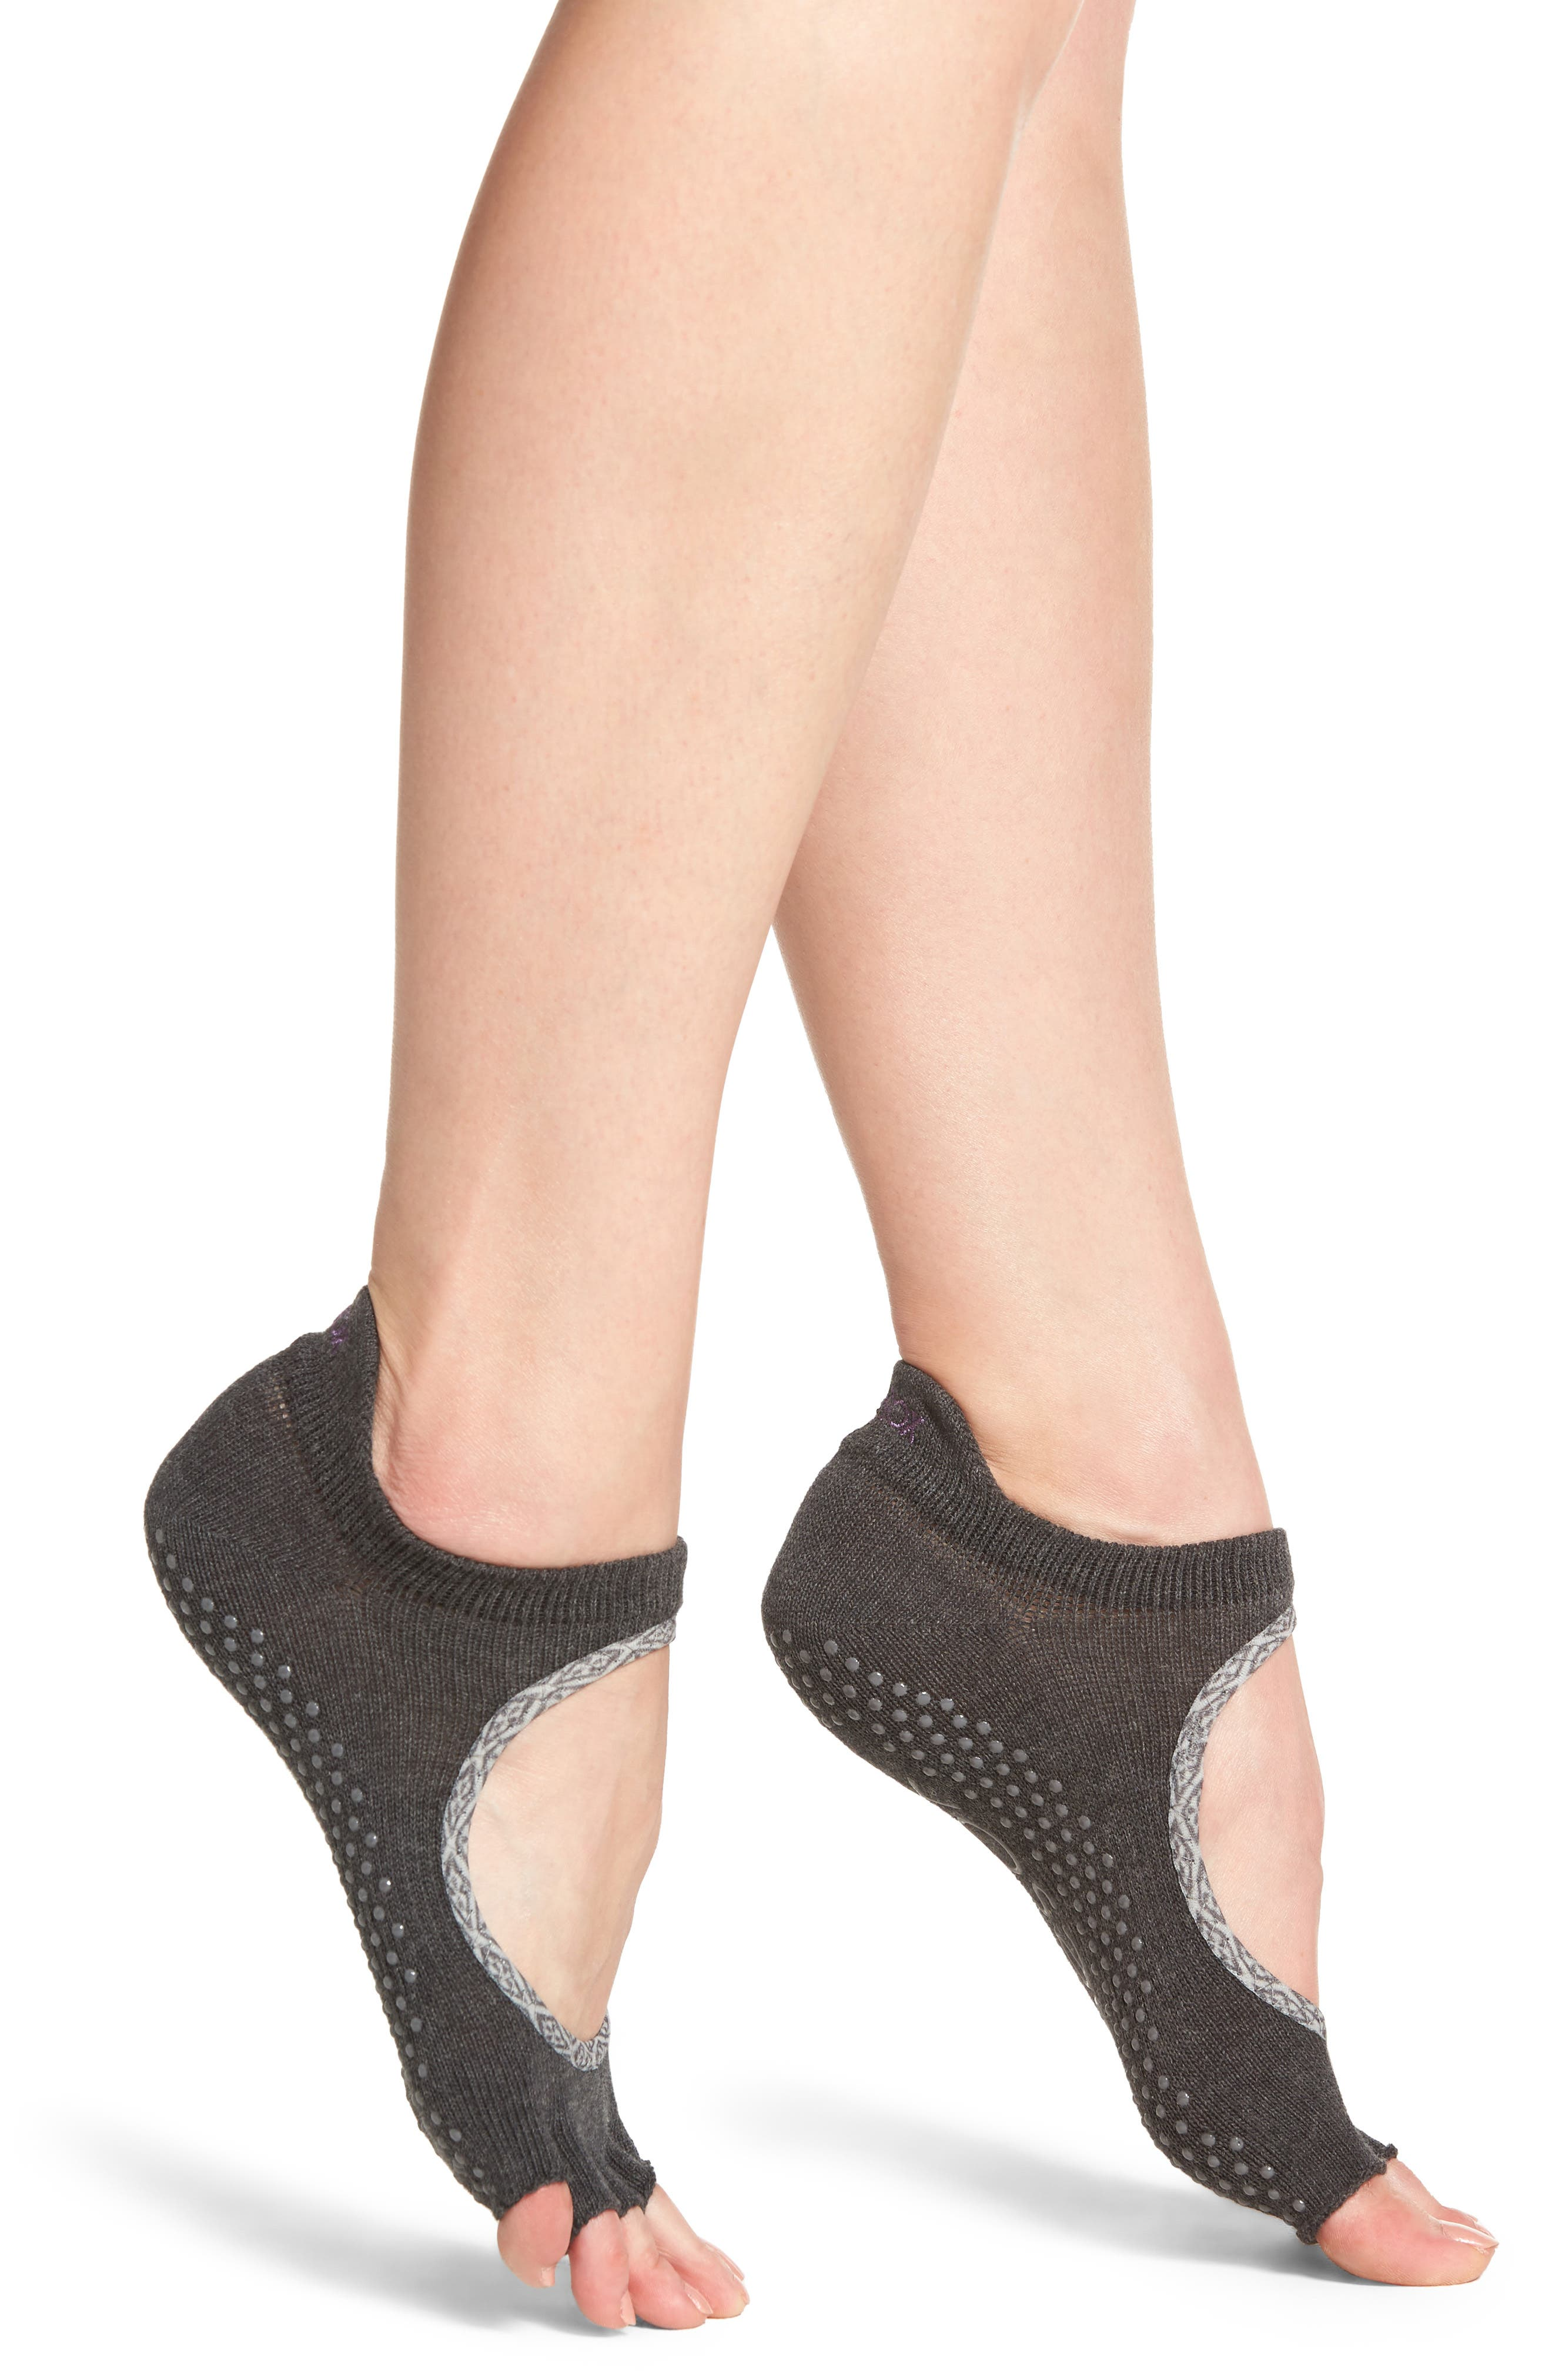 Bellarine Half Toe Gripper Socks,                         Main,                         color, 020